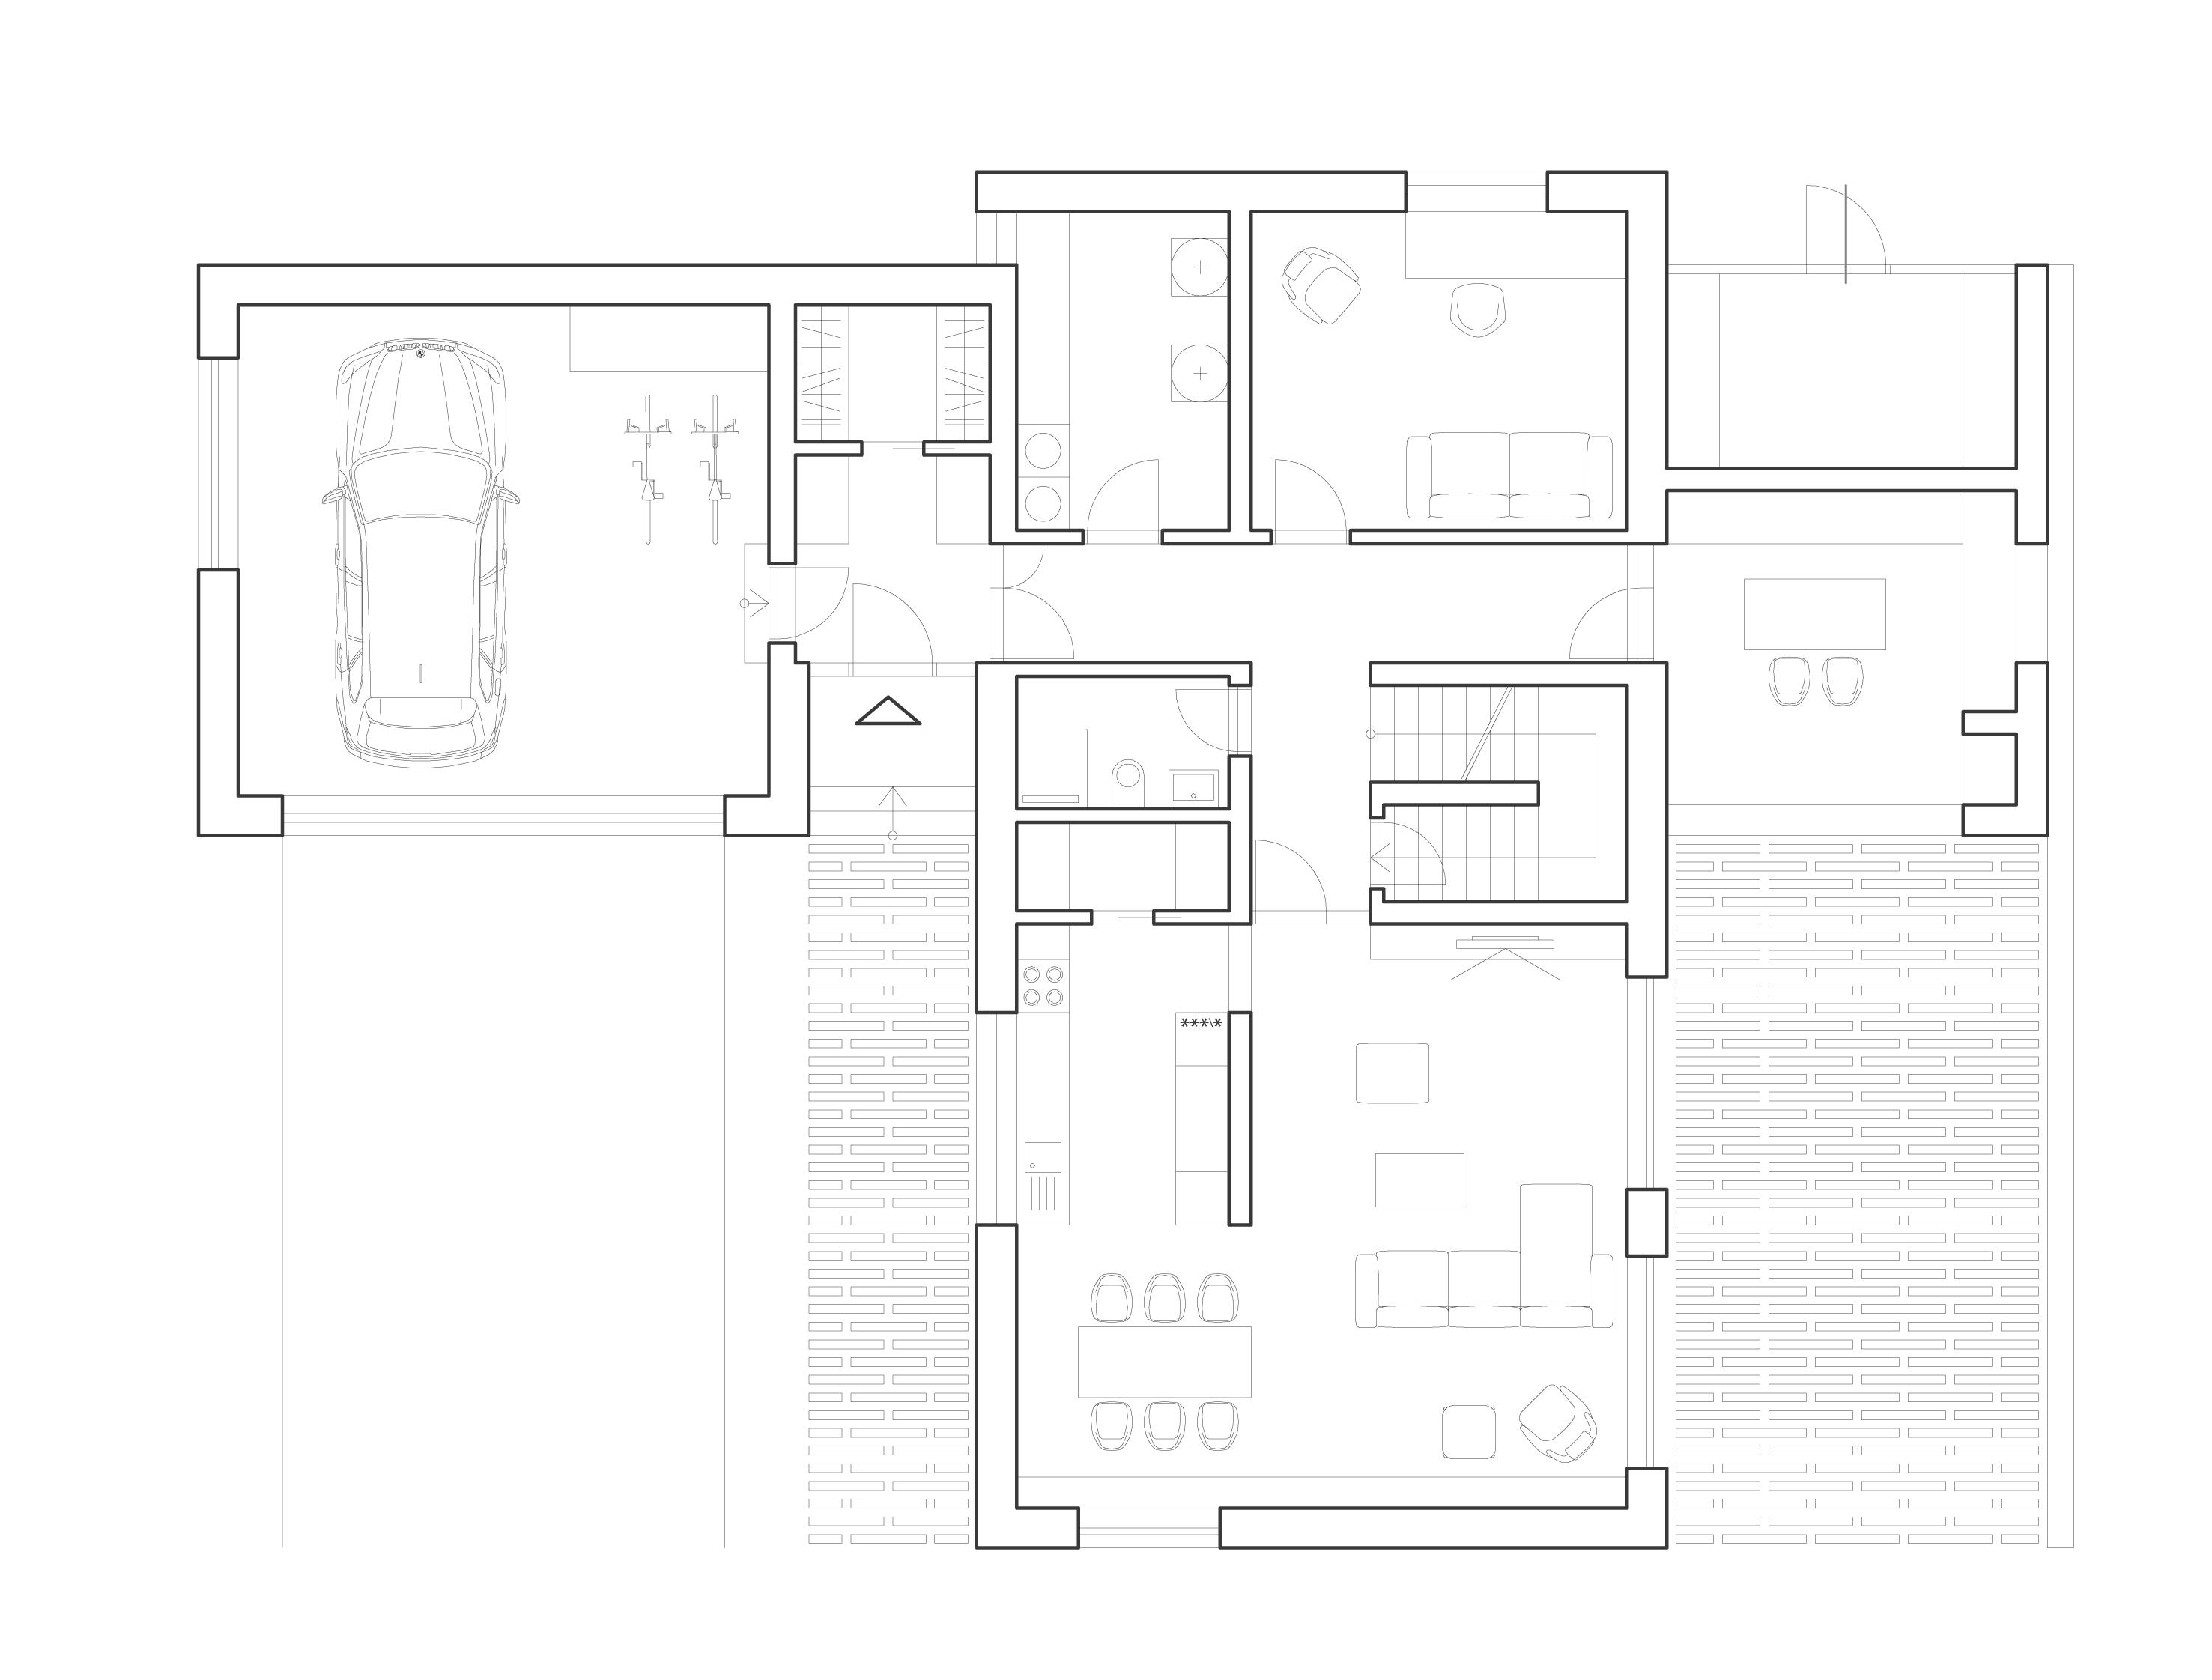 C:UsersLenovoDesktopm.aus architectsRD Dolní Lhota160906_